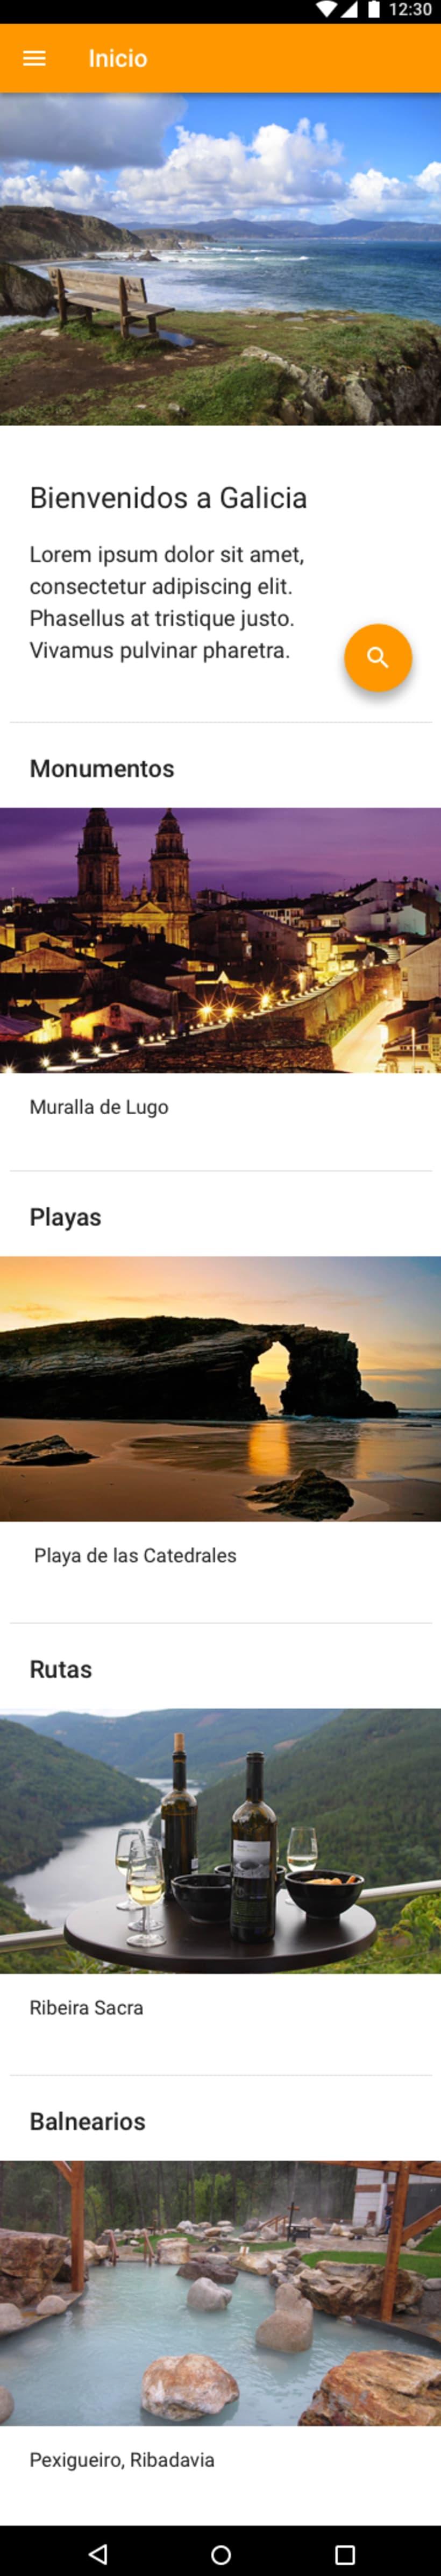 App Material Design 5